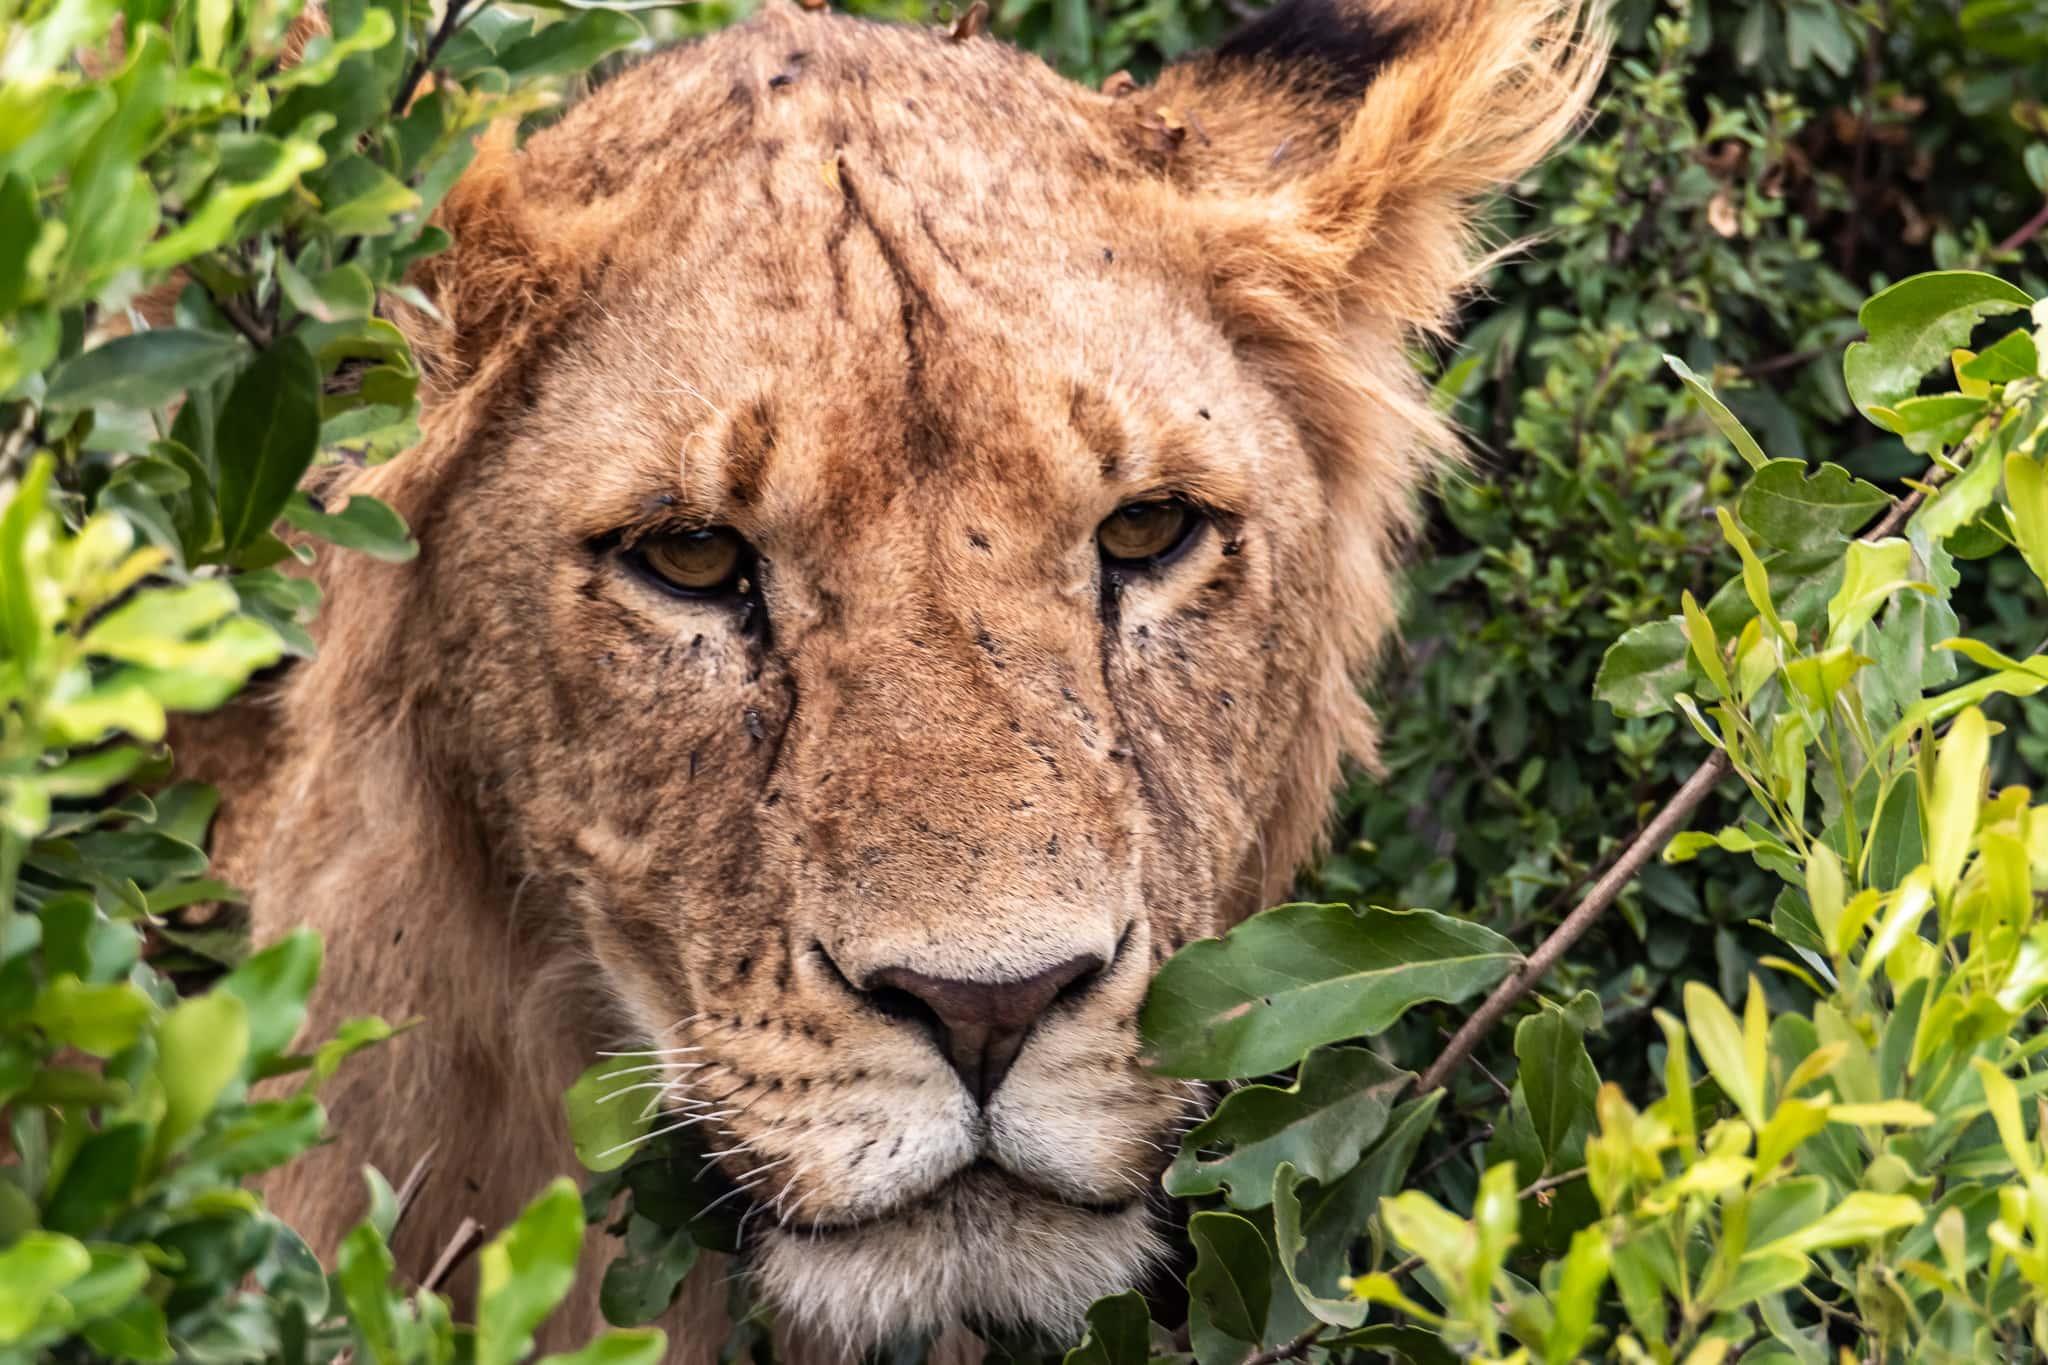 A day in the Masai Mara